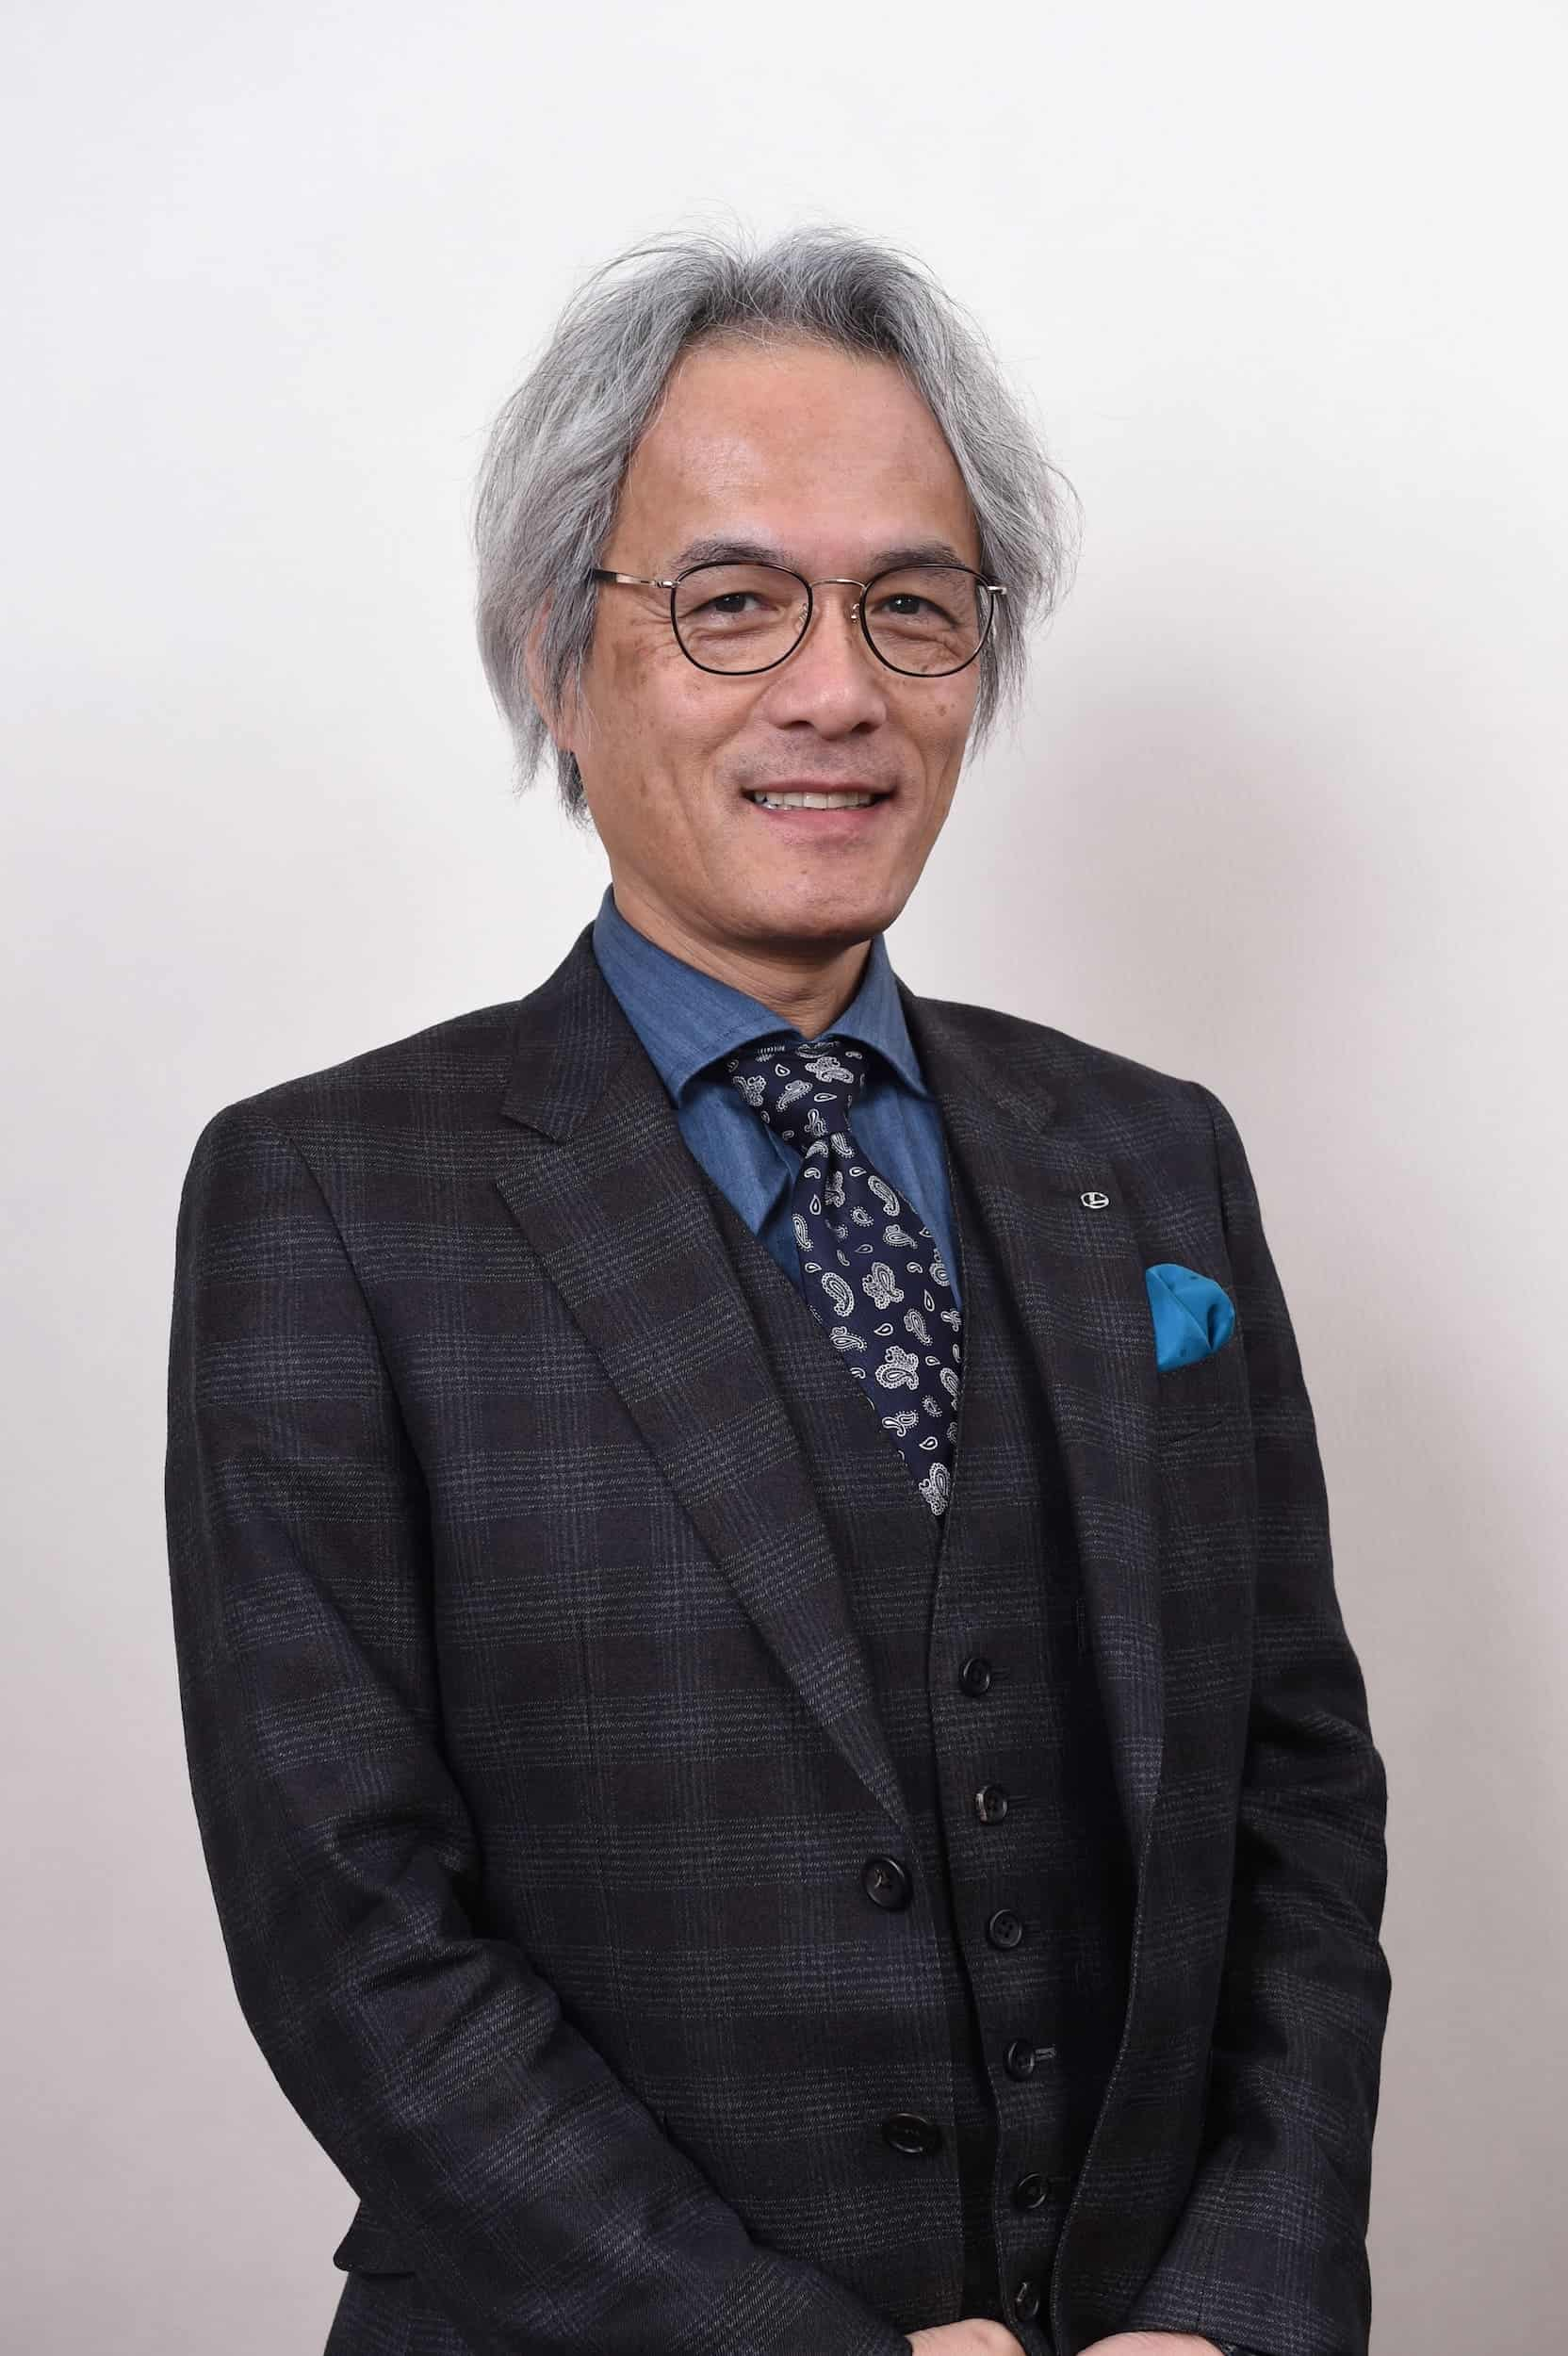 Йосихиро Сава lexus design award 2019 Объявлен судейский состав Lexus Design Award 2019 Yoshihiro Sawa